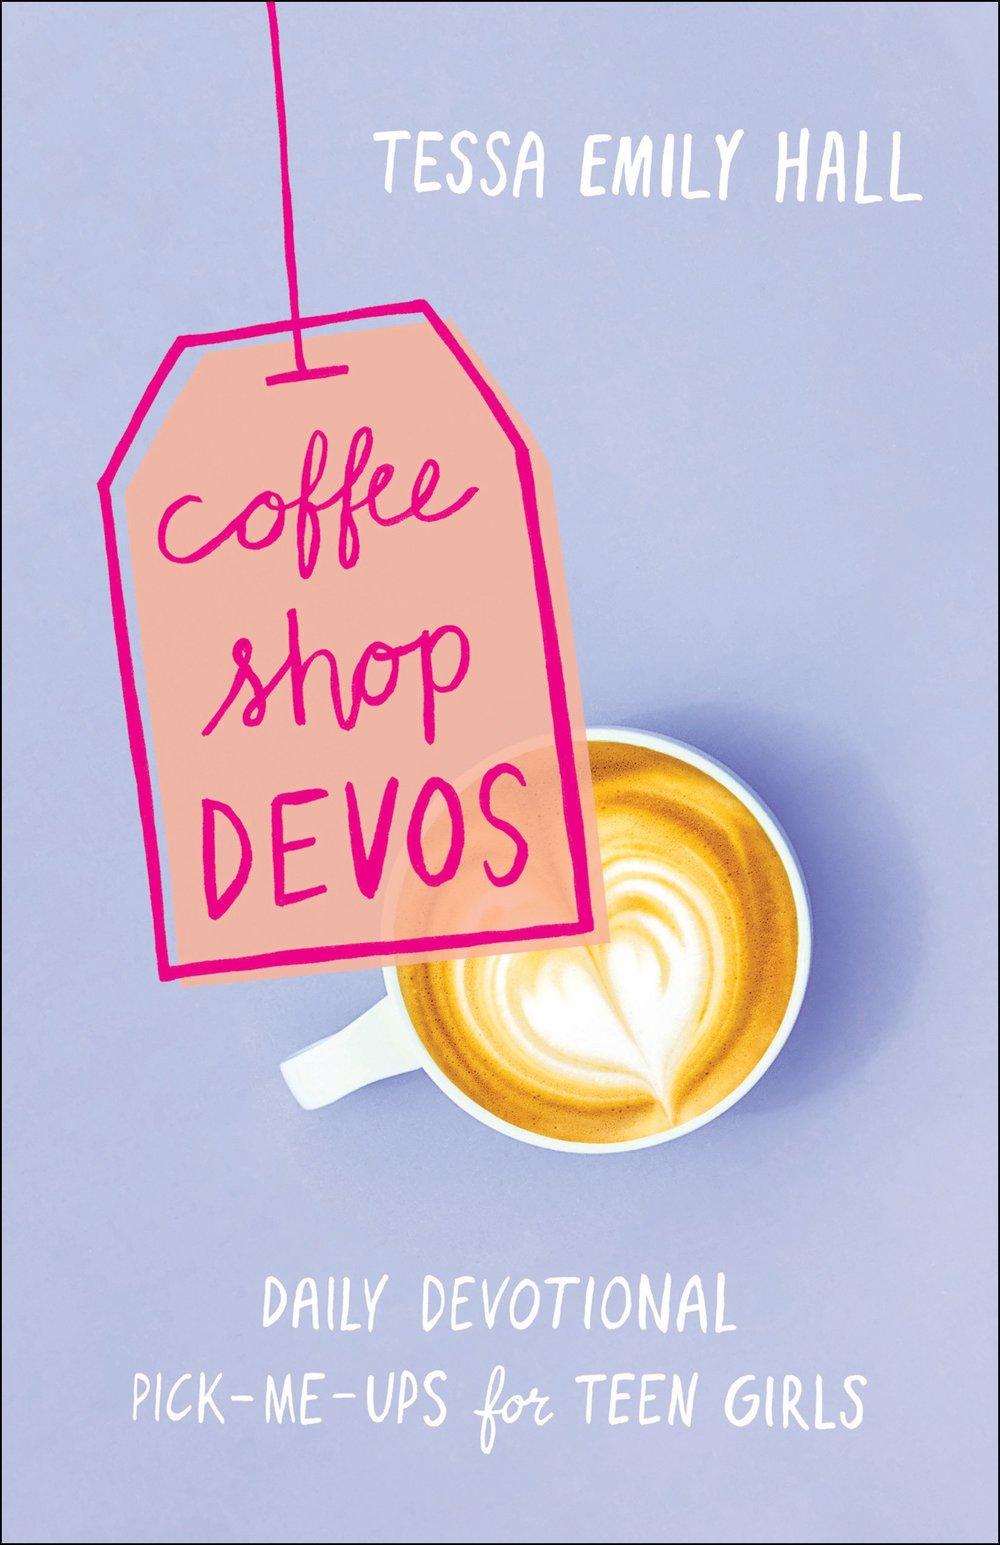 Coffee Shop Devos Tessa .jpg